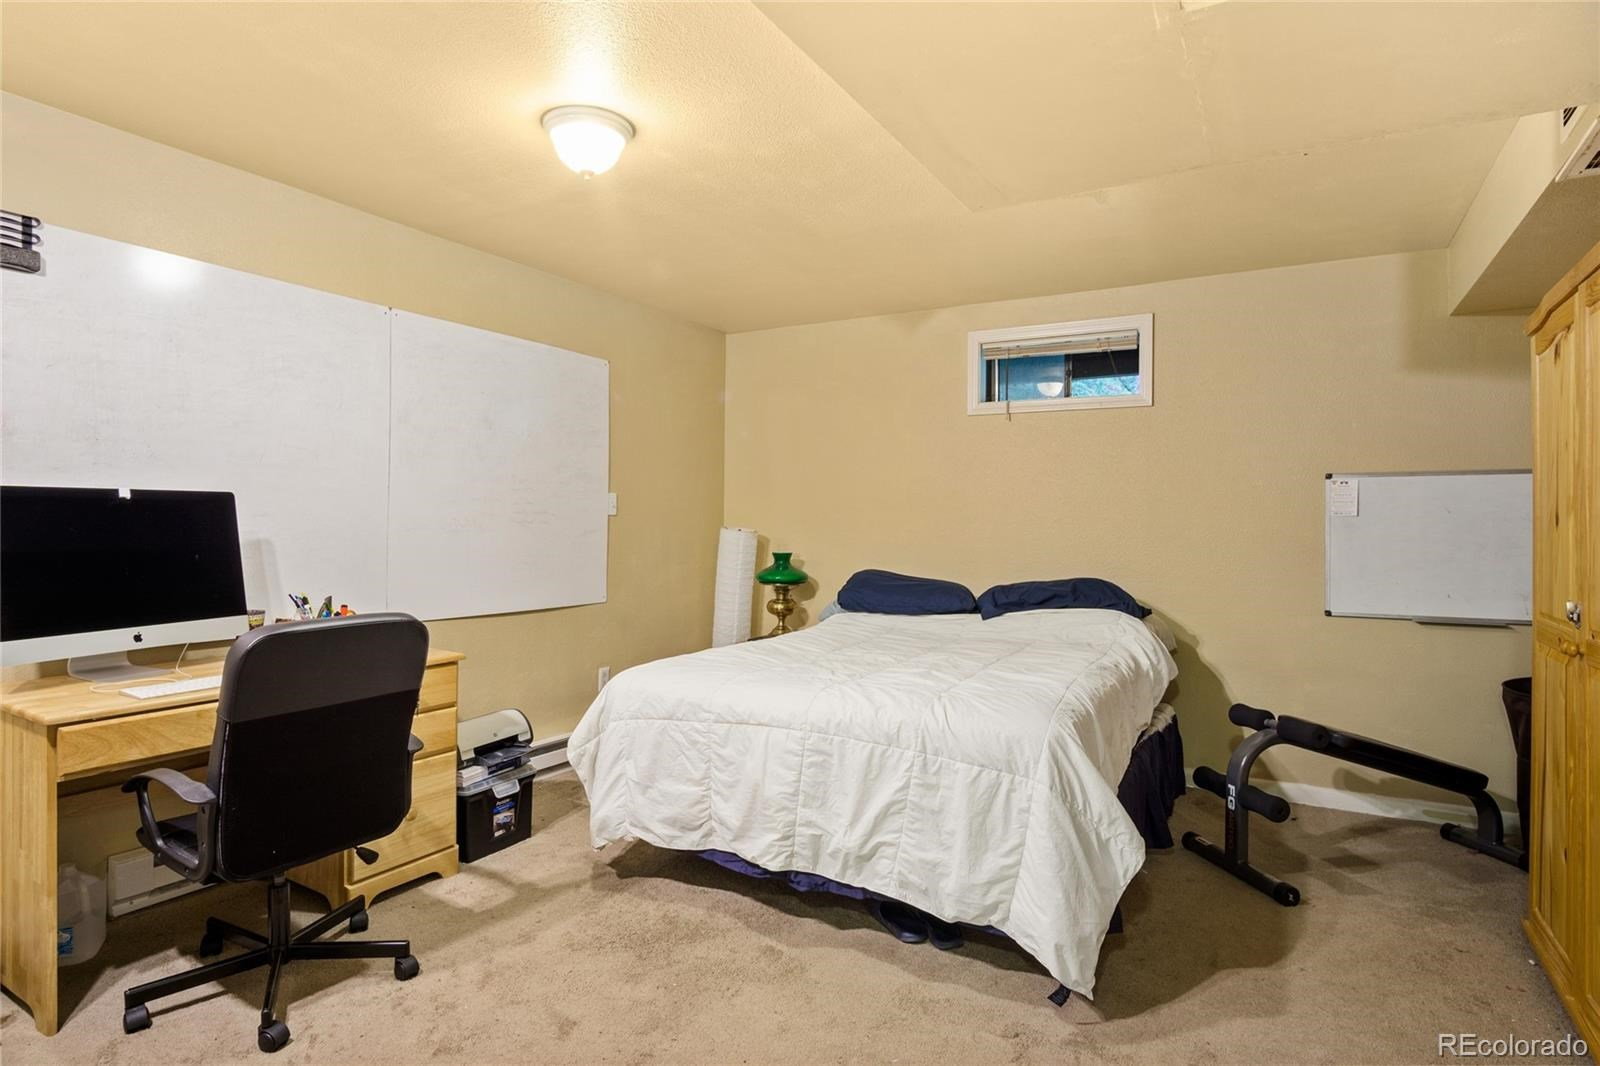 MLS# 5887293 - 25 - 8858 Black Mountain Drive, Conifer, CO 80433